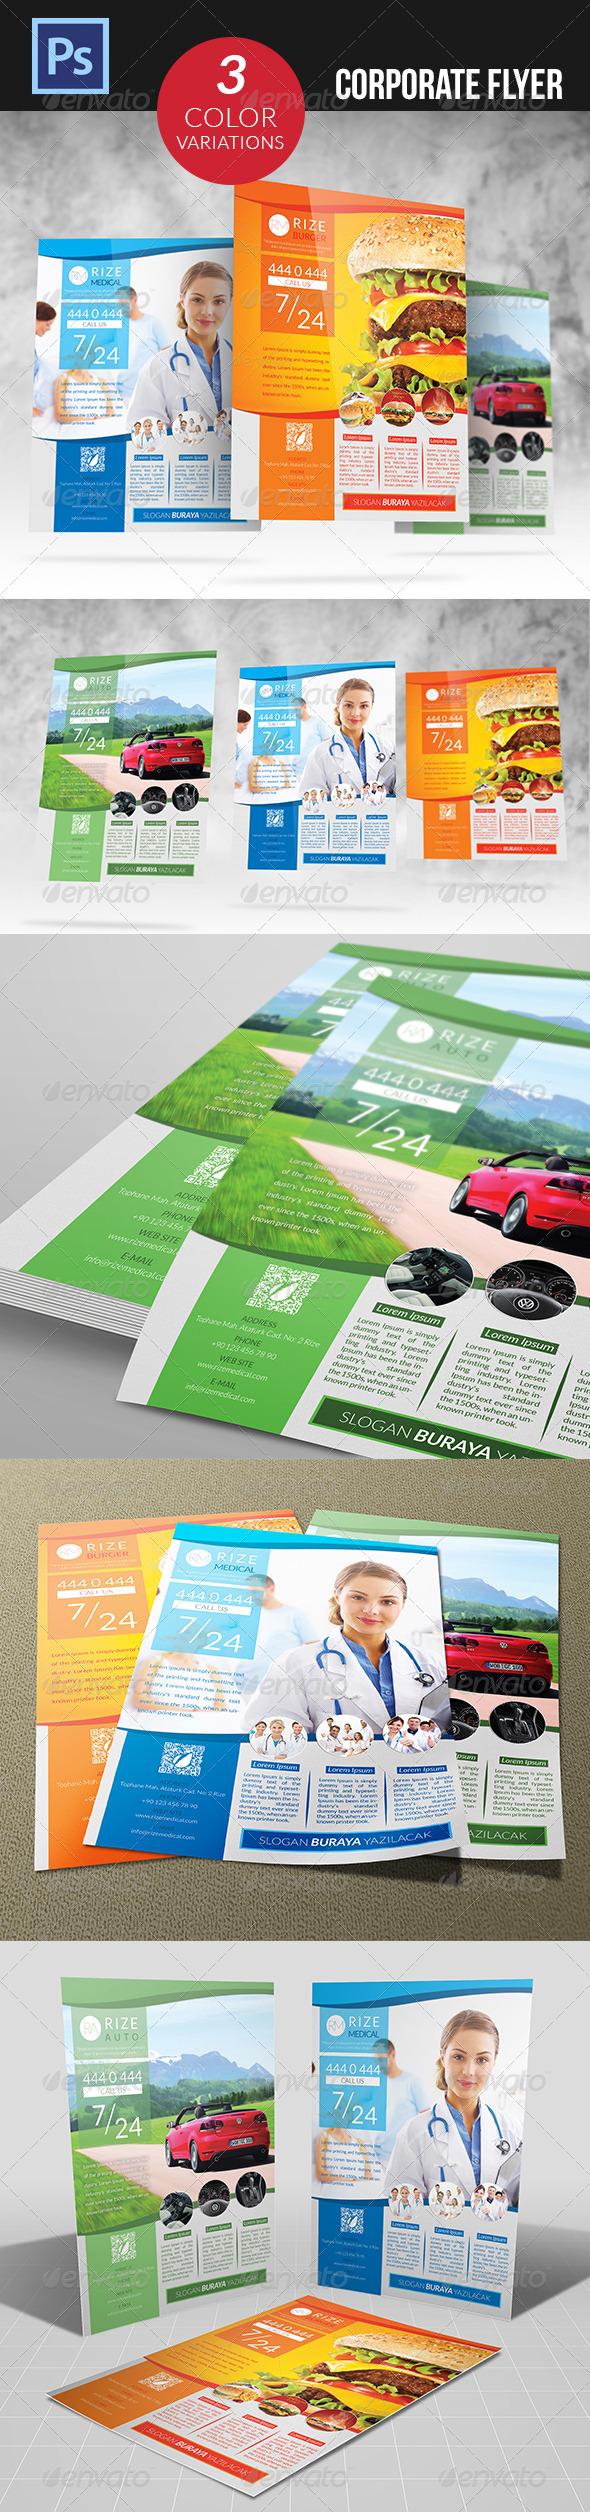 GraphicRiver Corporate Flyer 4737550